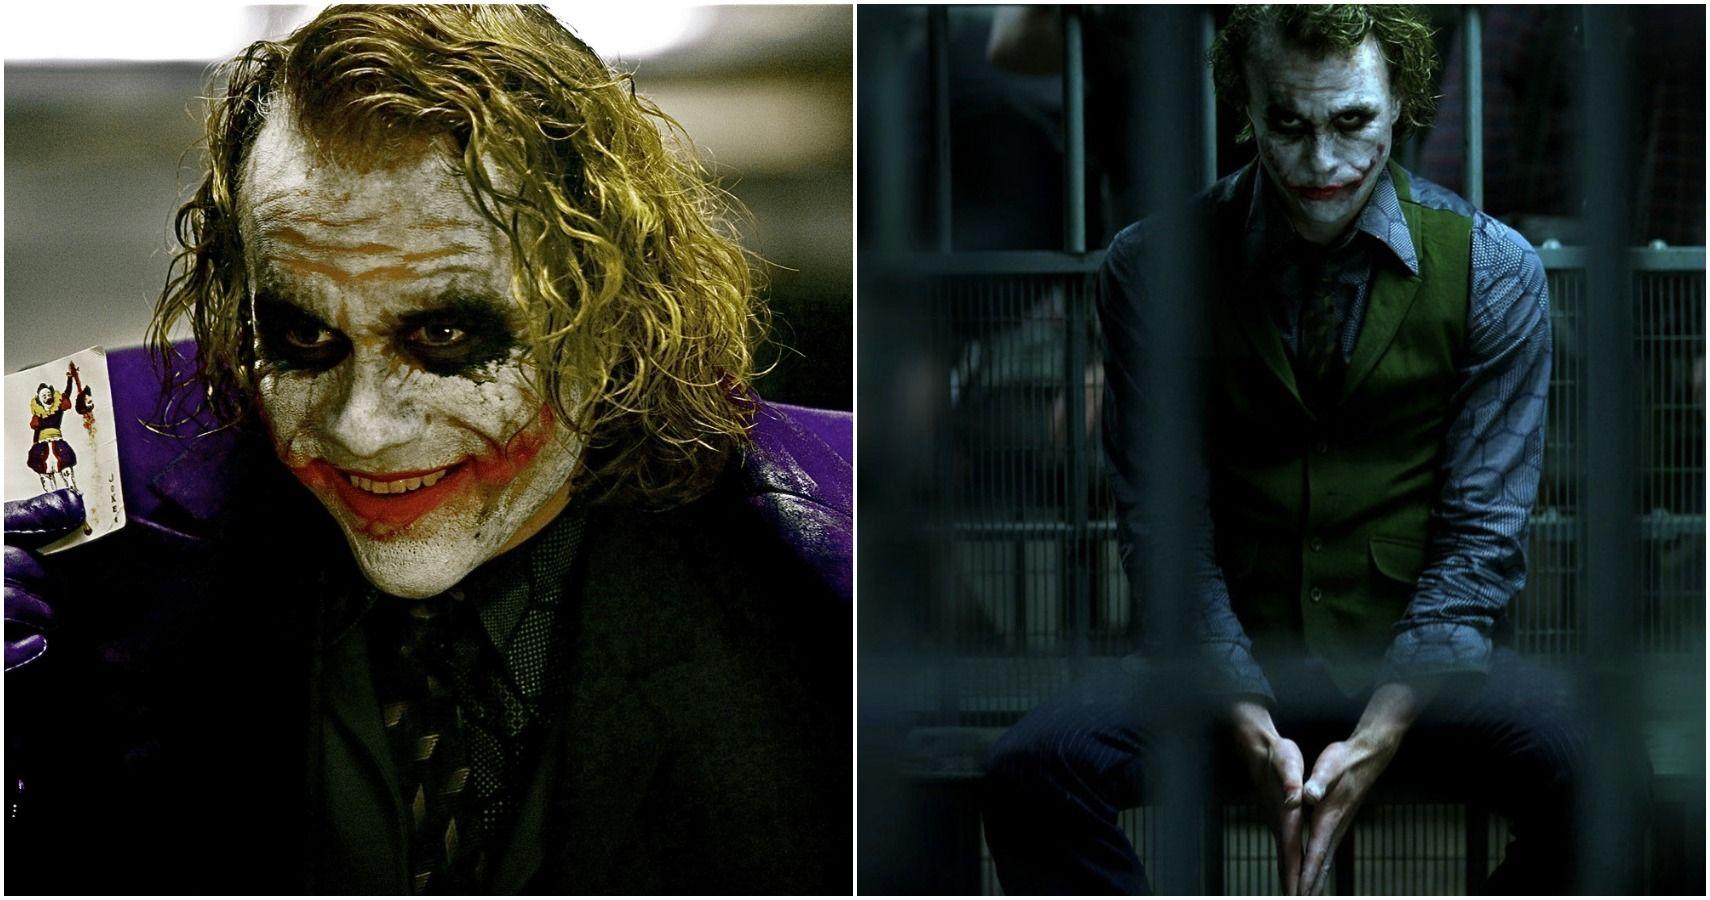 The Dark Knight 15 Greatest Quotes By Heath Ledger S Joker